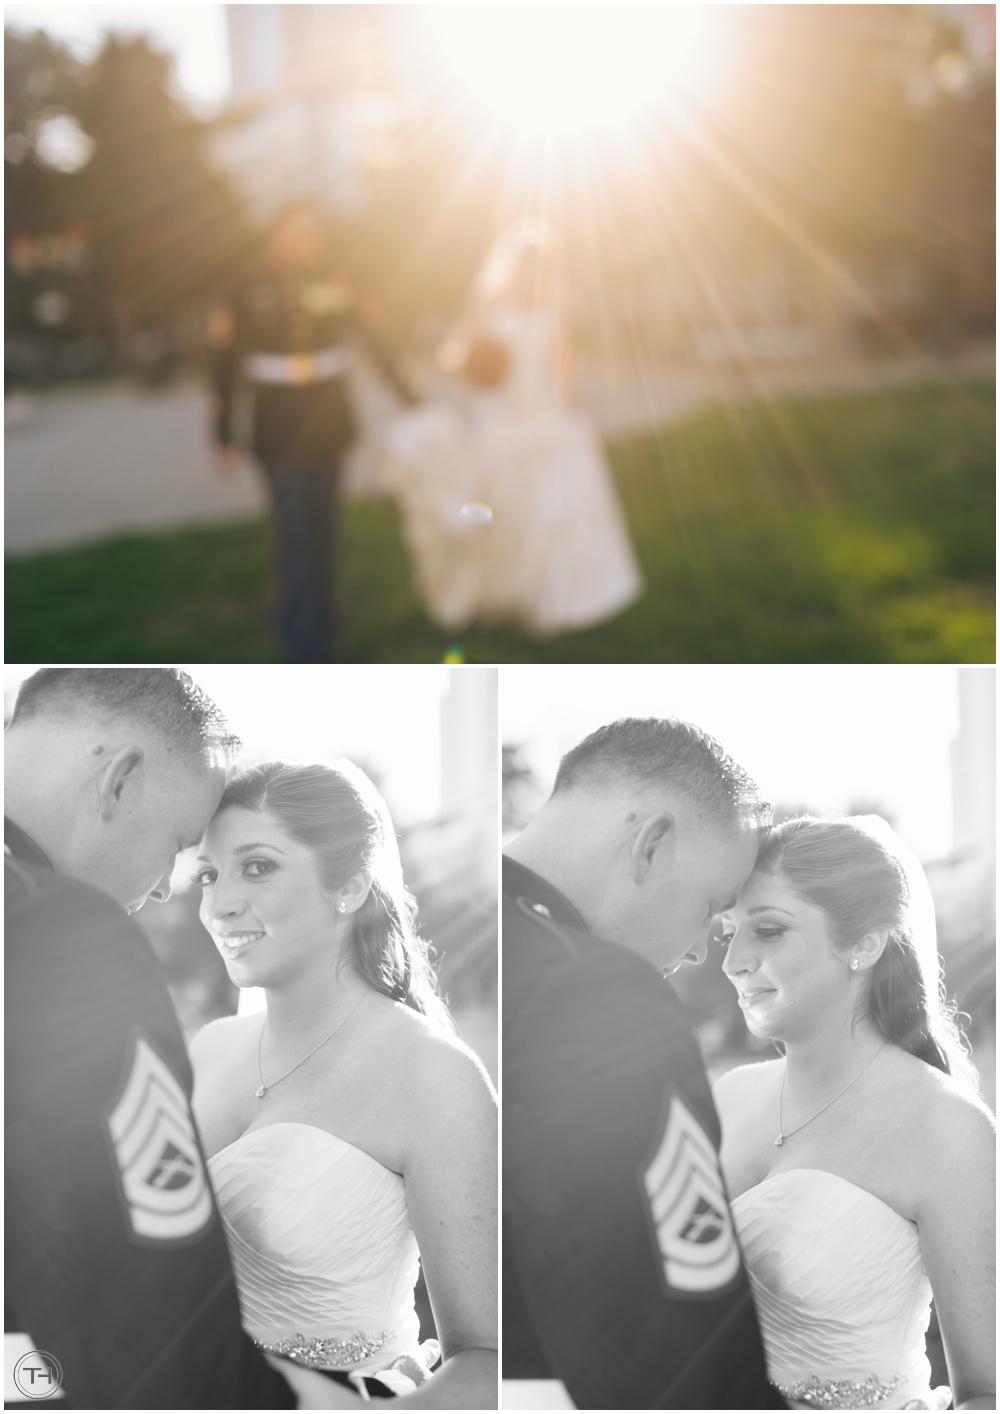 Thomas Julianna Military Wedding Photographer 31.jpg